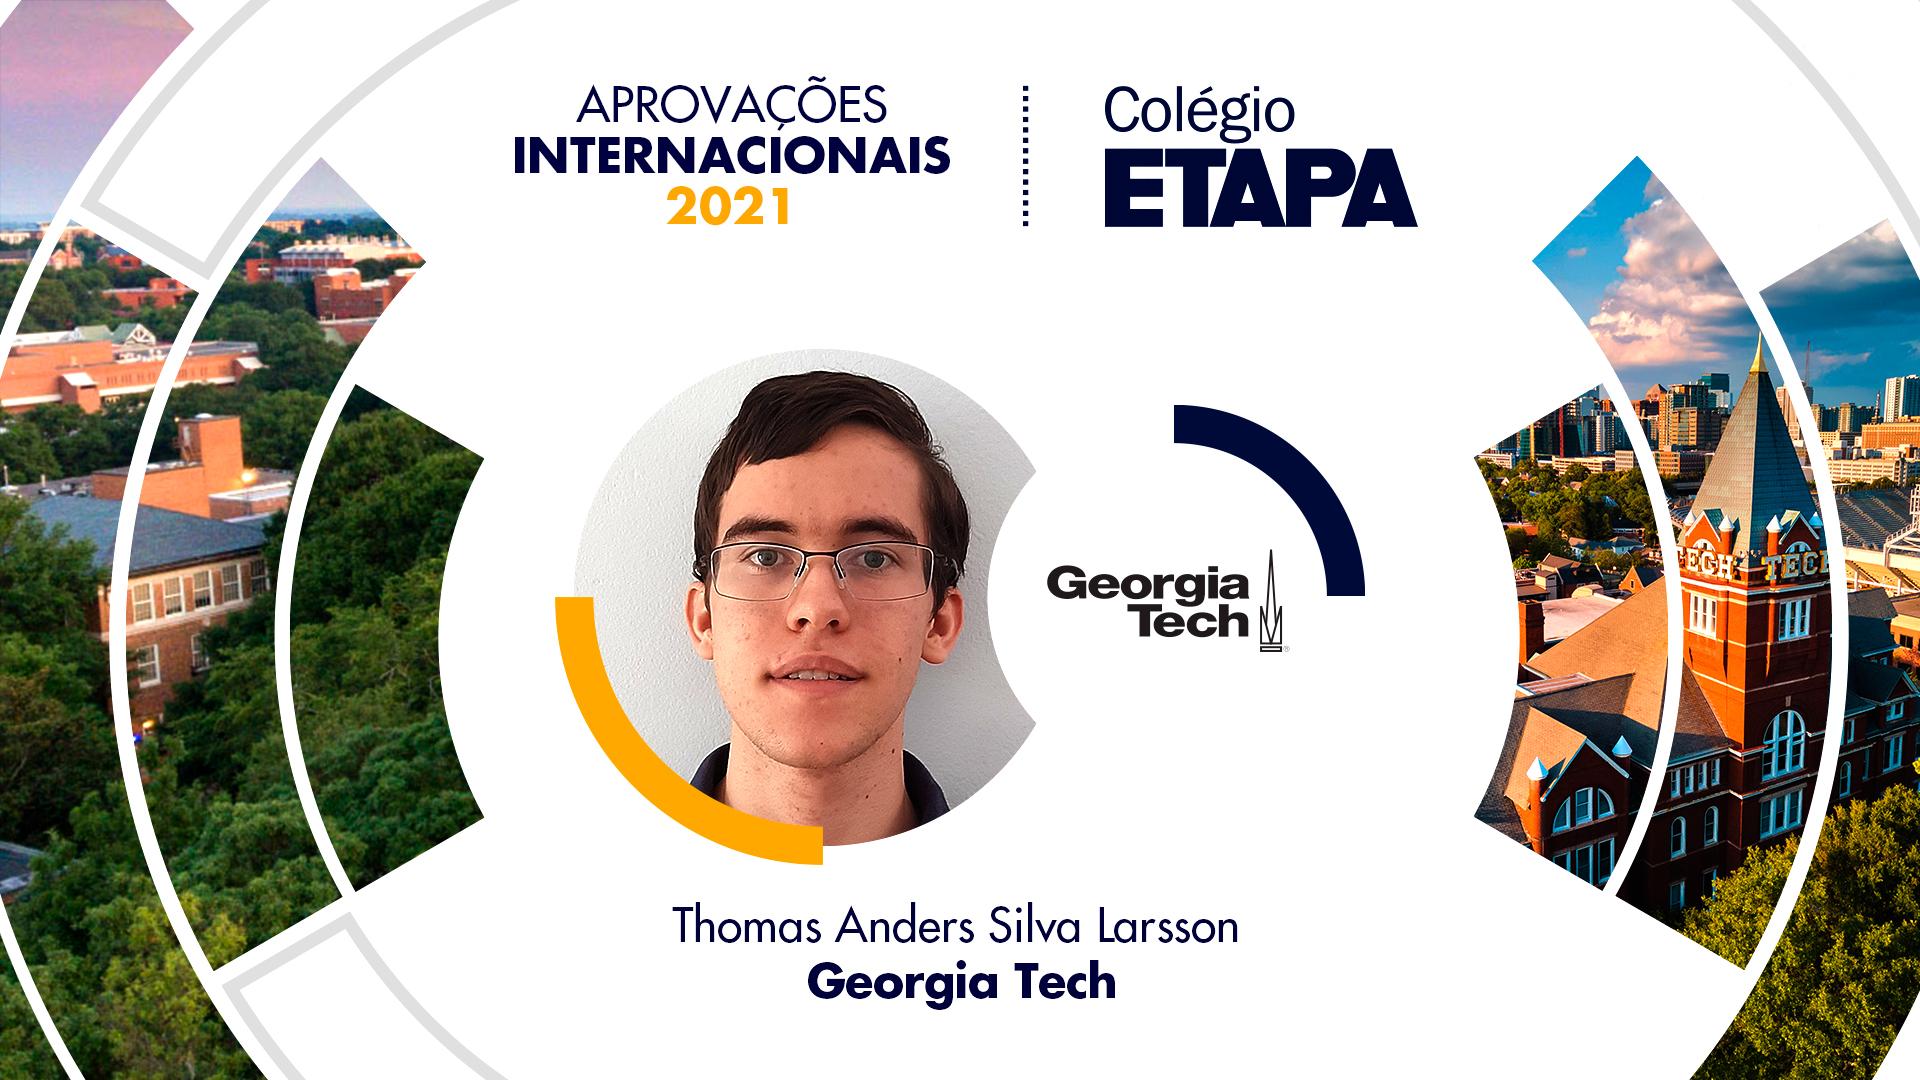 Thomas Anders Silva Larsson vai estudar Engenharia Química no Georgia Institute of Technology.